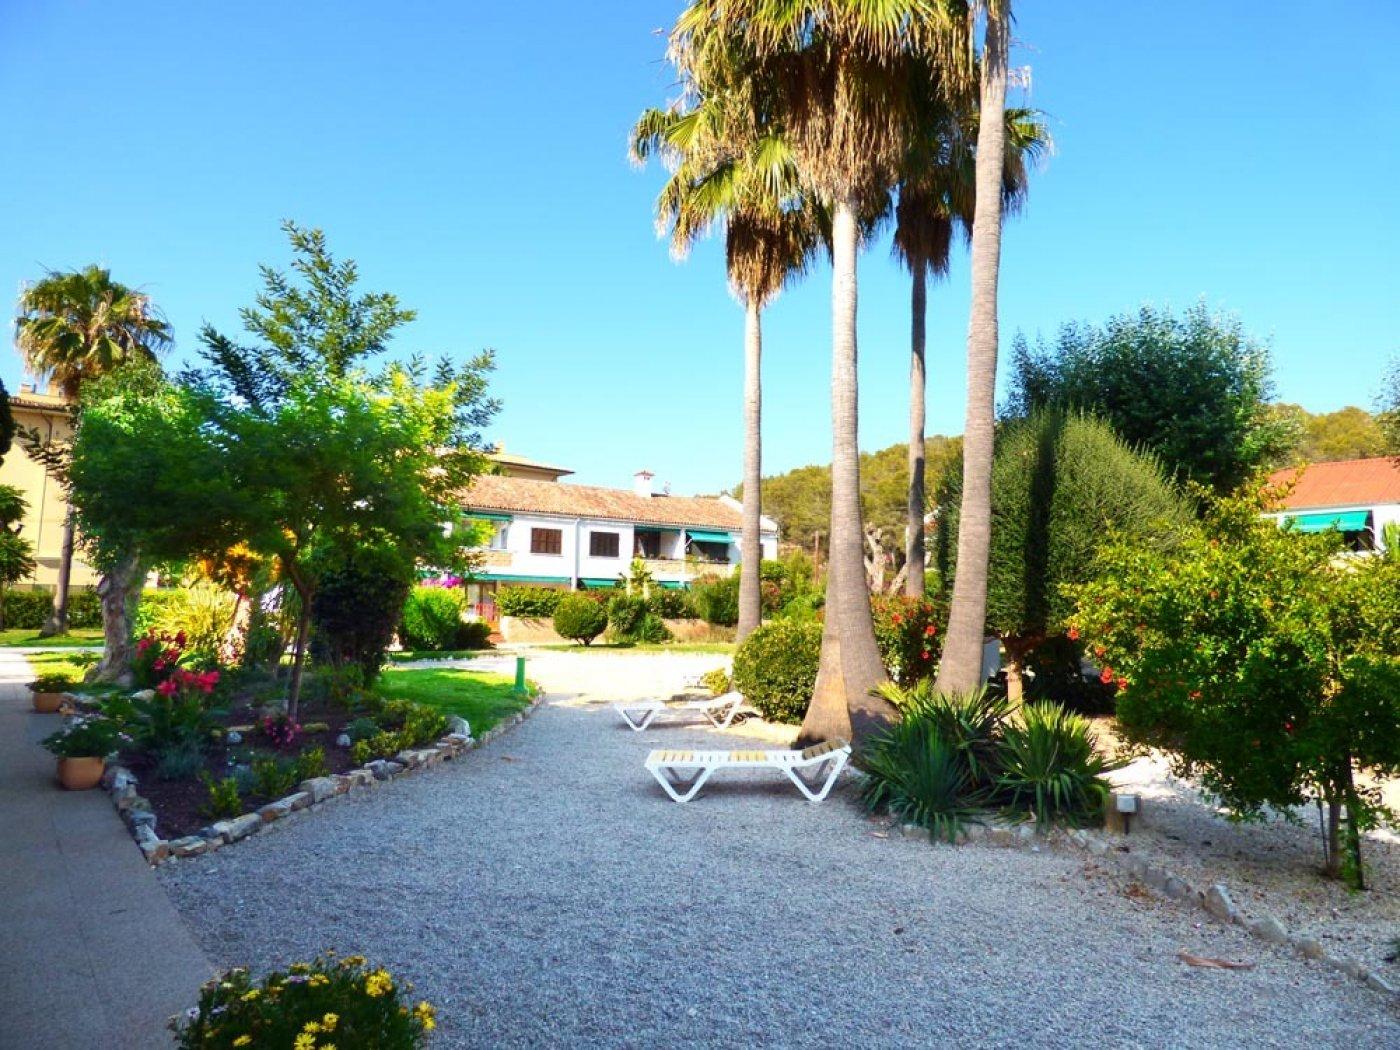 Apartment for sale in Peguera, Calvia